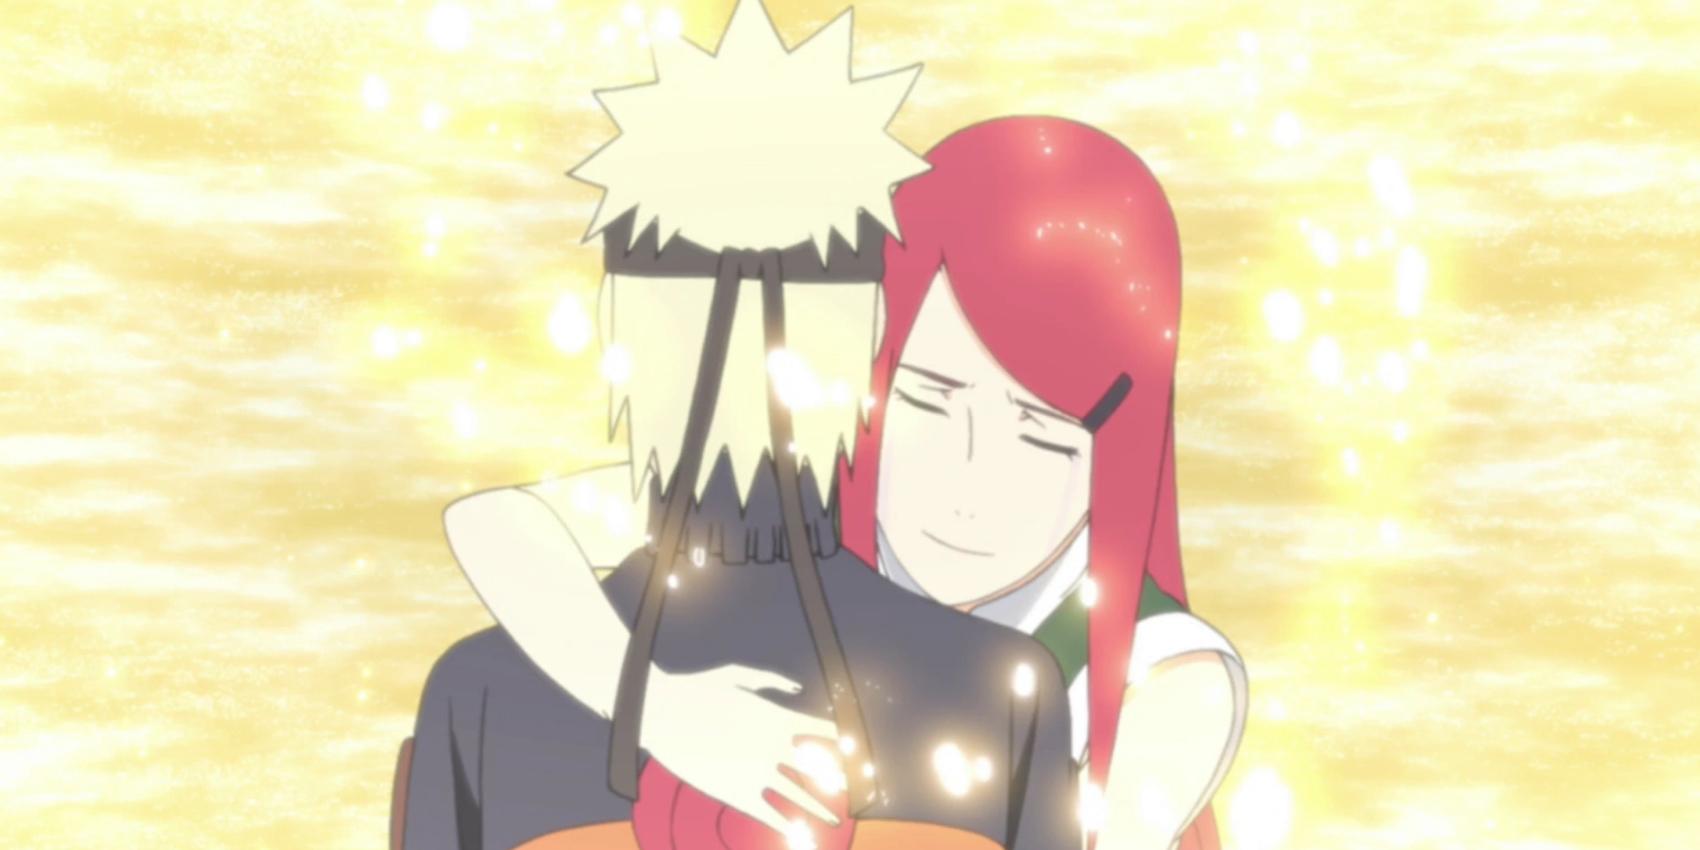 10 Best Episodes Of Naruto Shippuden According To IMDb